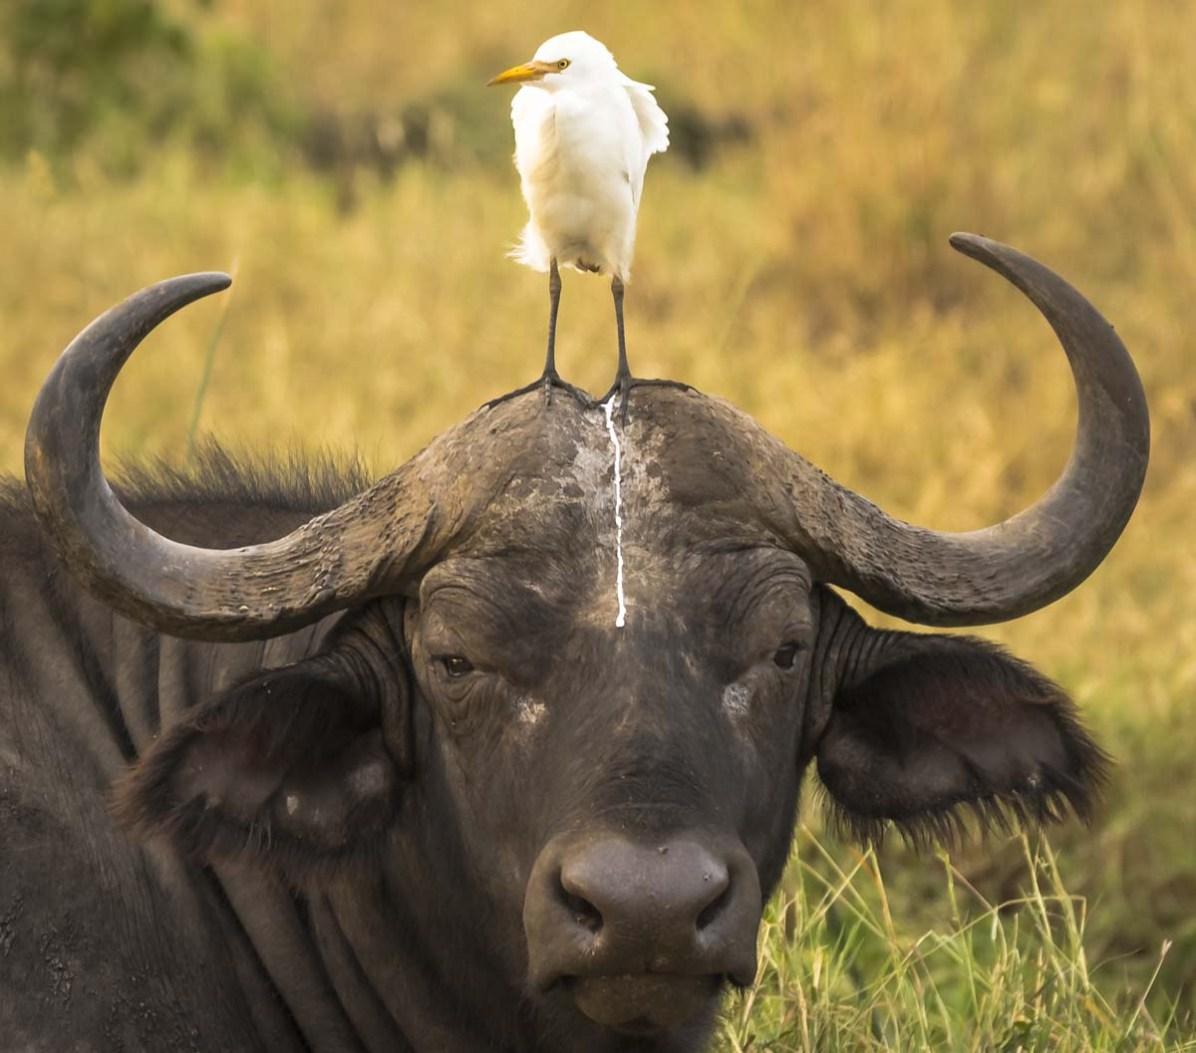 © Tom Stables, comedy wildlife photo awards 2016